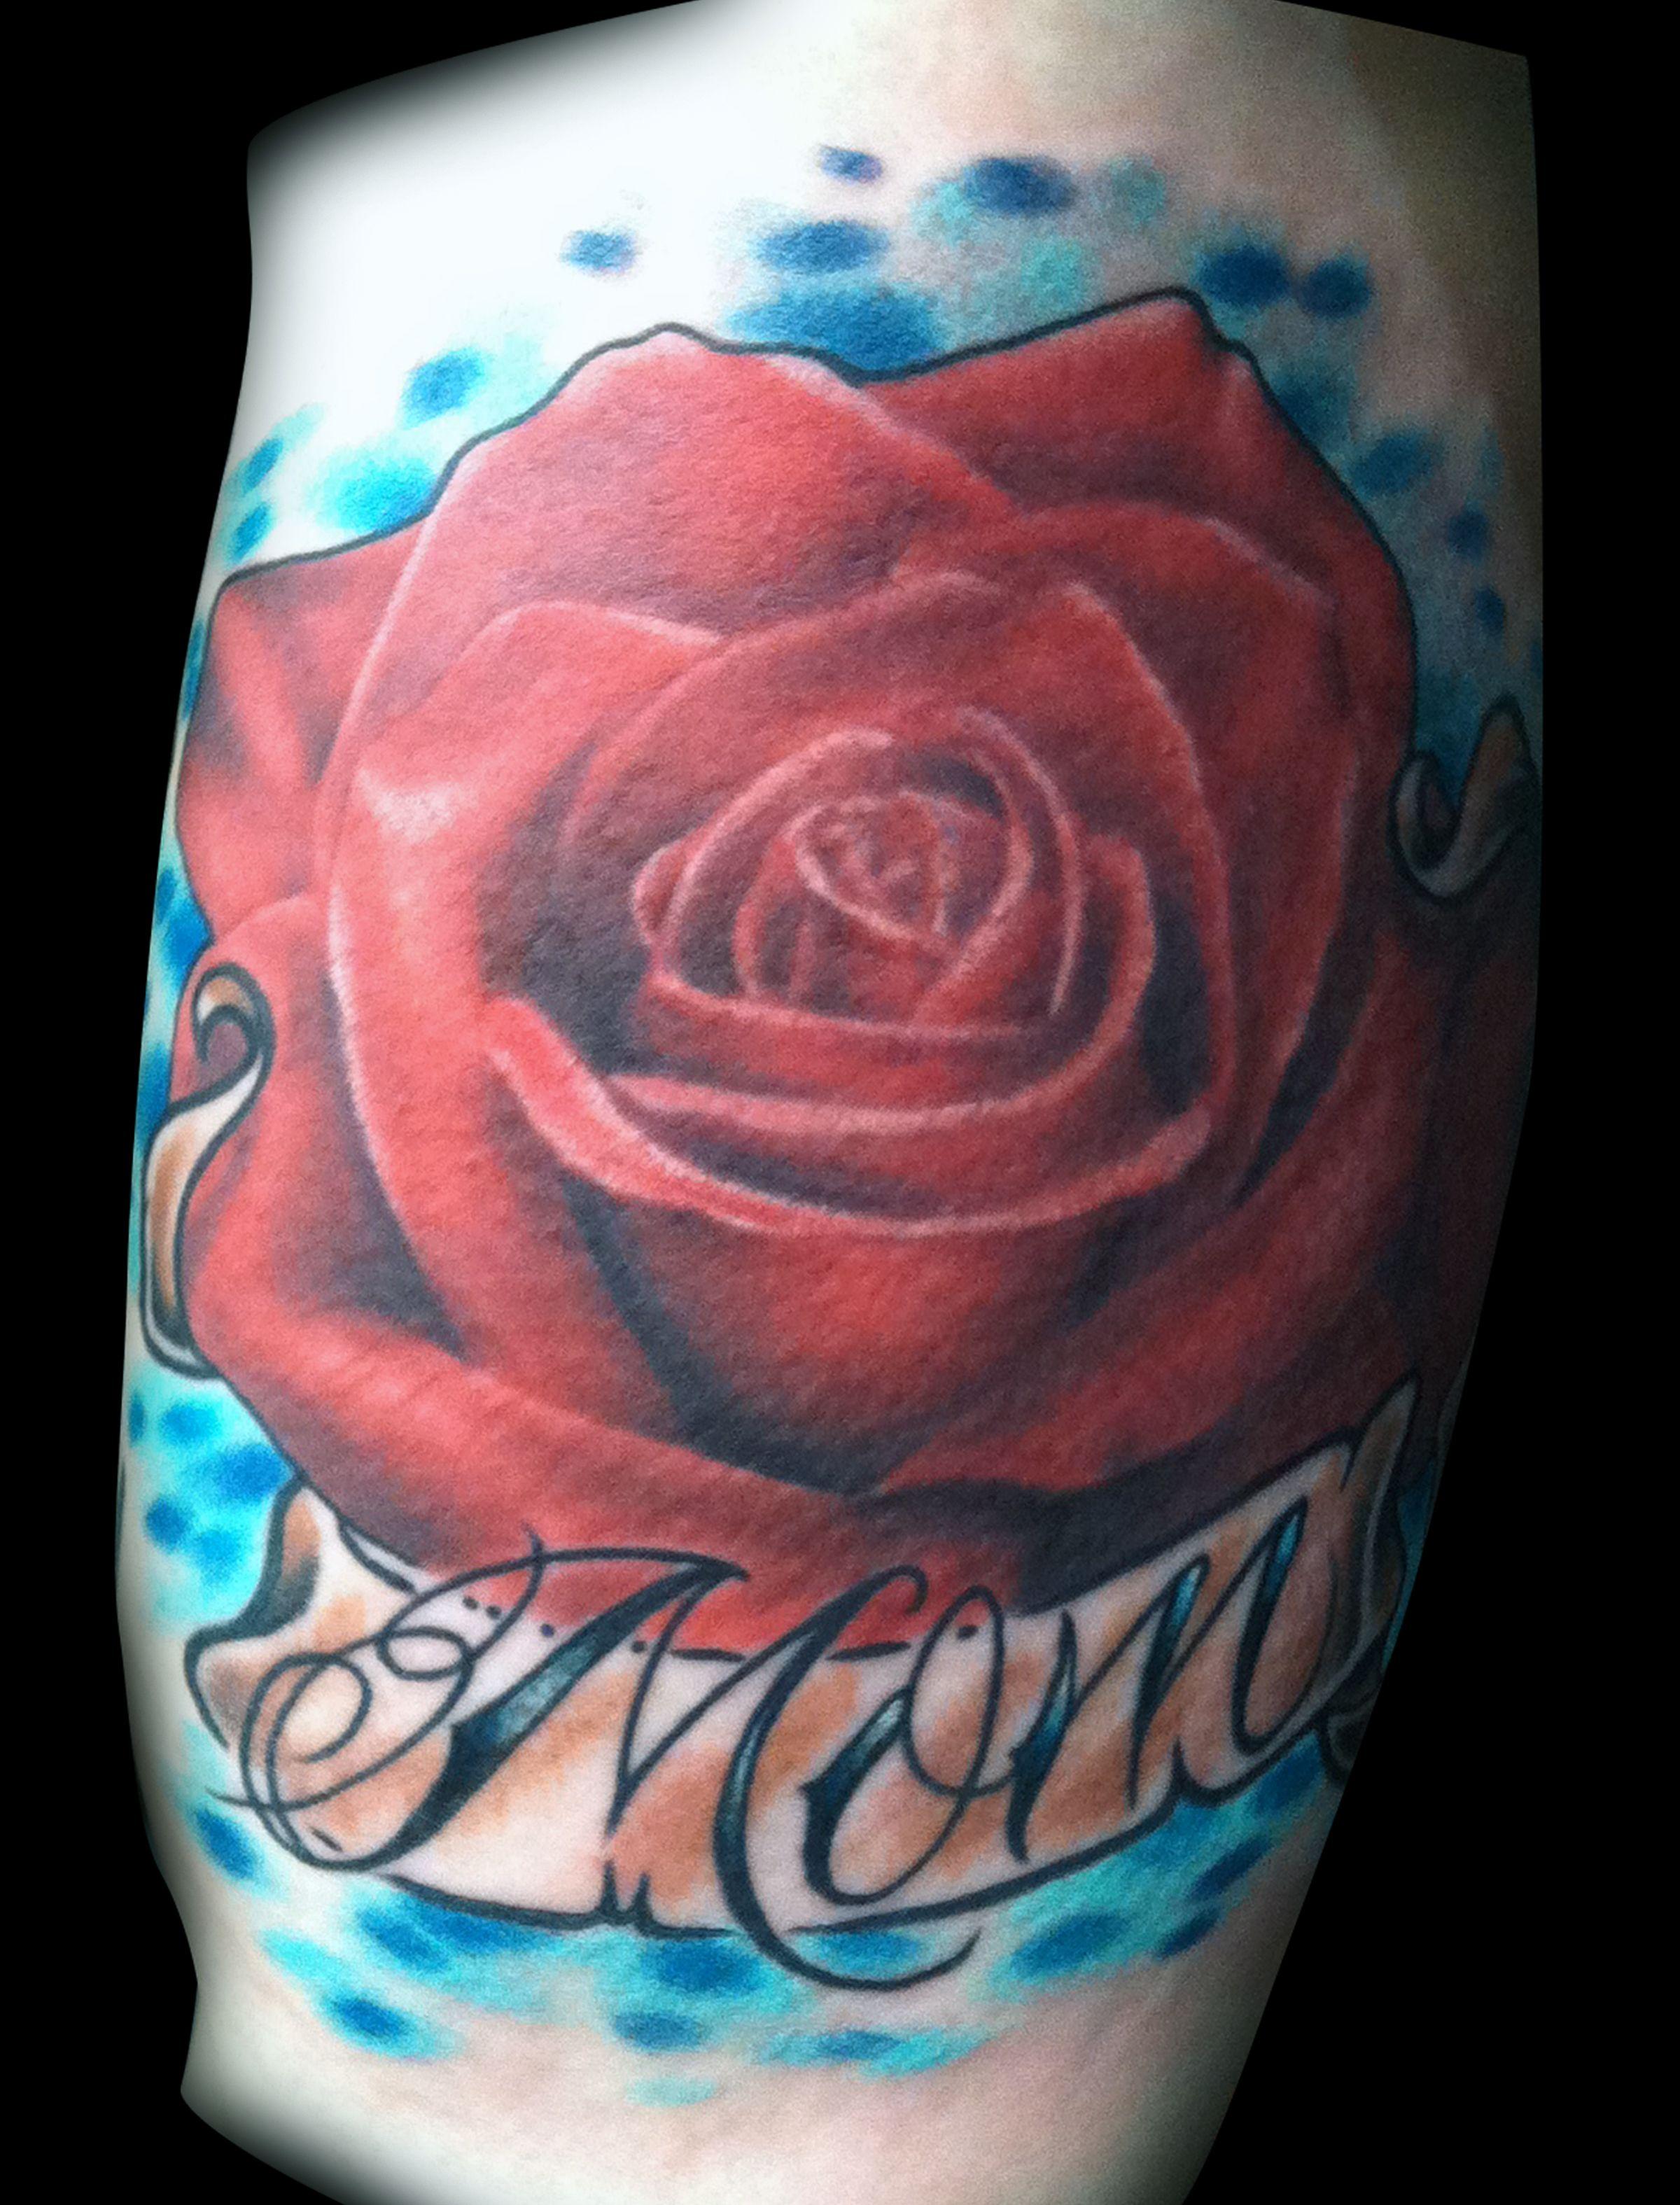 39876529285cf Realistic Rose Tattoo with Mom Banner - tattoo by Matt Skin ...